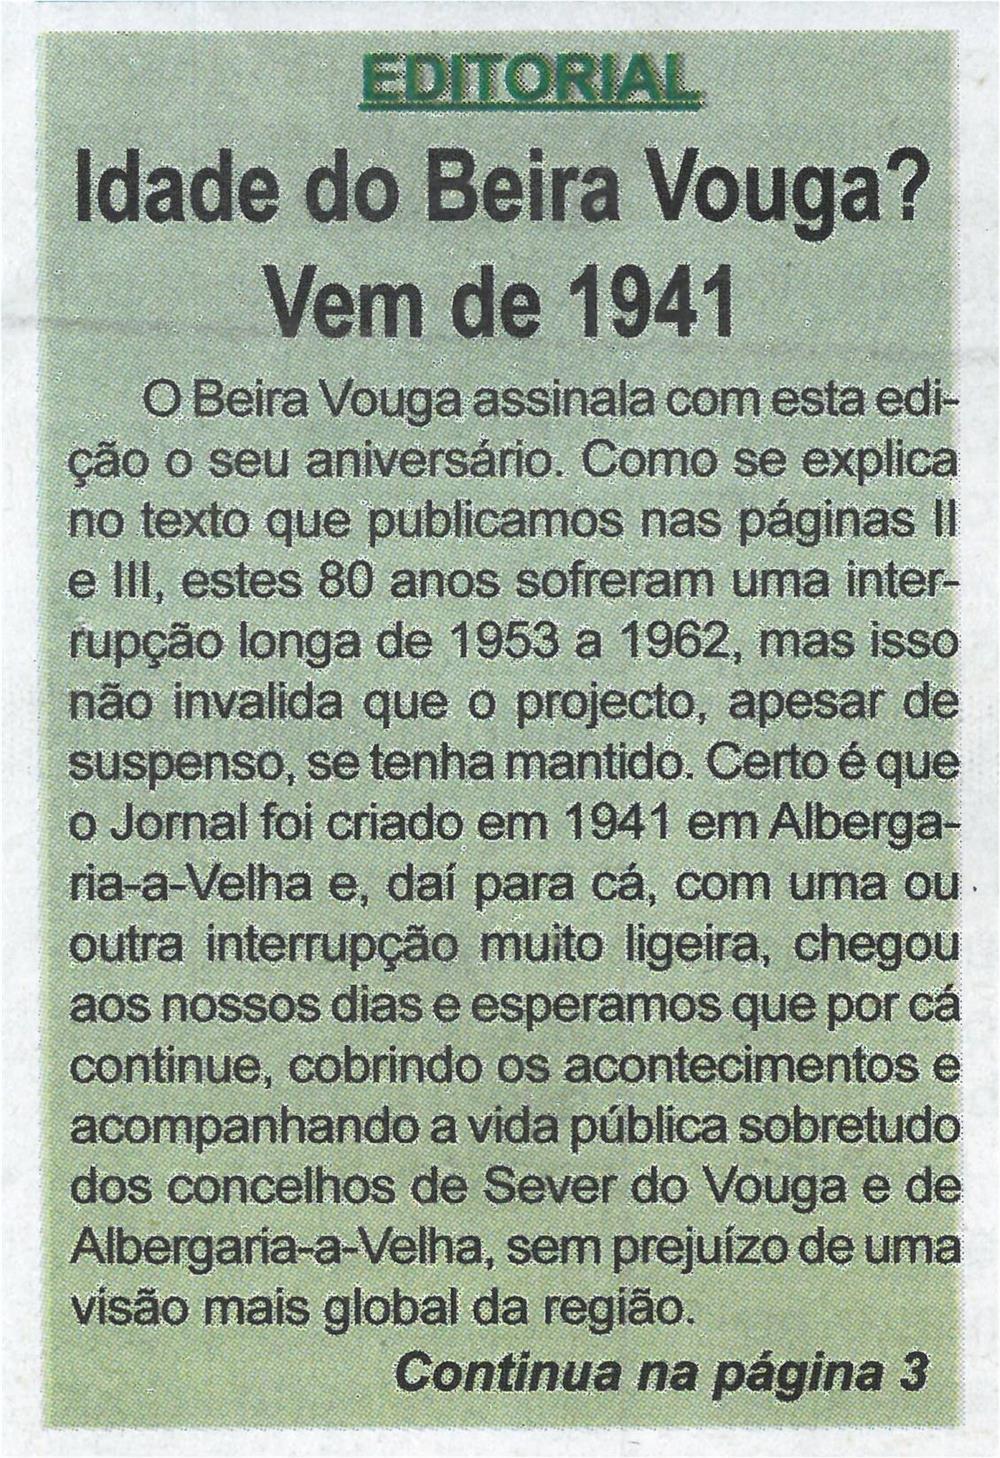 BV-1.ªjul.'21-p.1-Editorial : idade do Beira Vouga? : vem de 1941.jpg